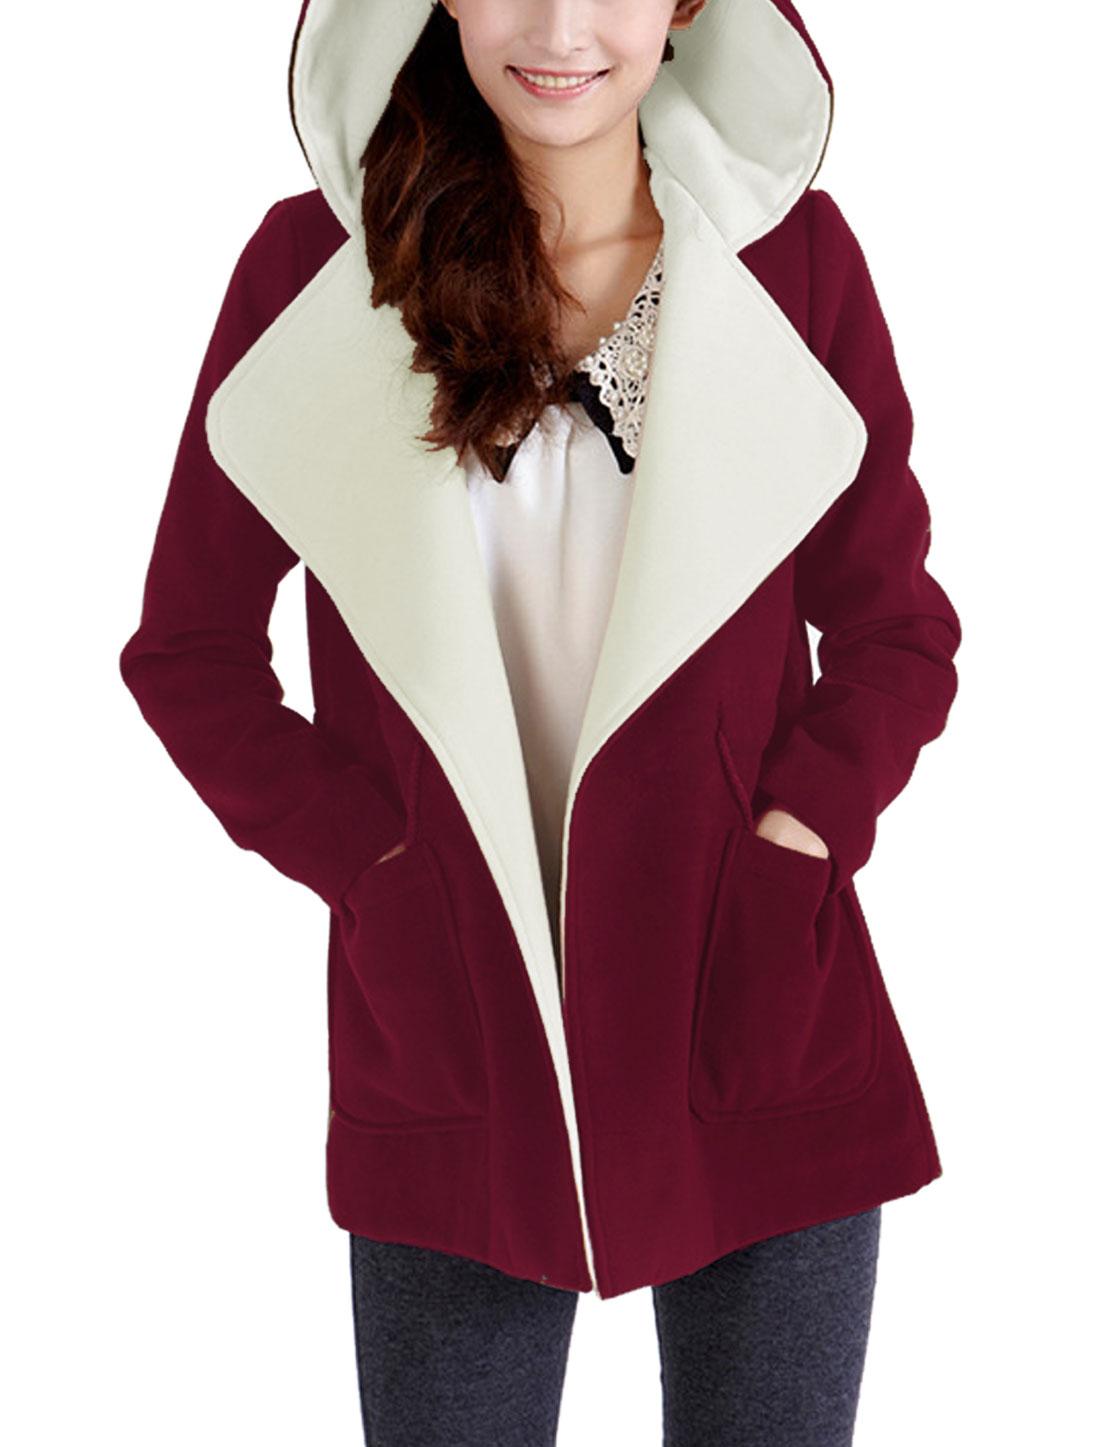 Women Turn Down Collar Long Sleeves Hooded Worsted Coat Burgundy M